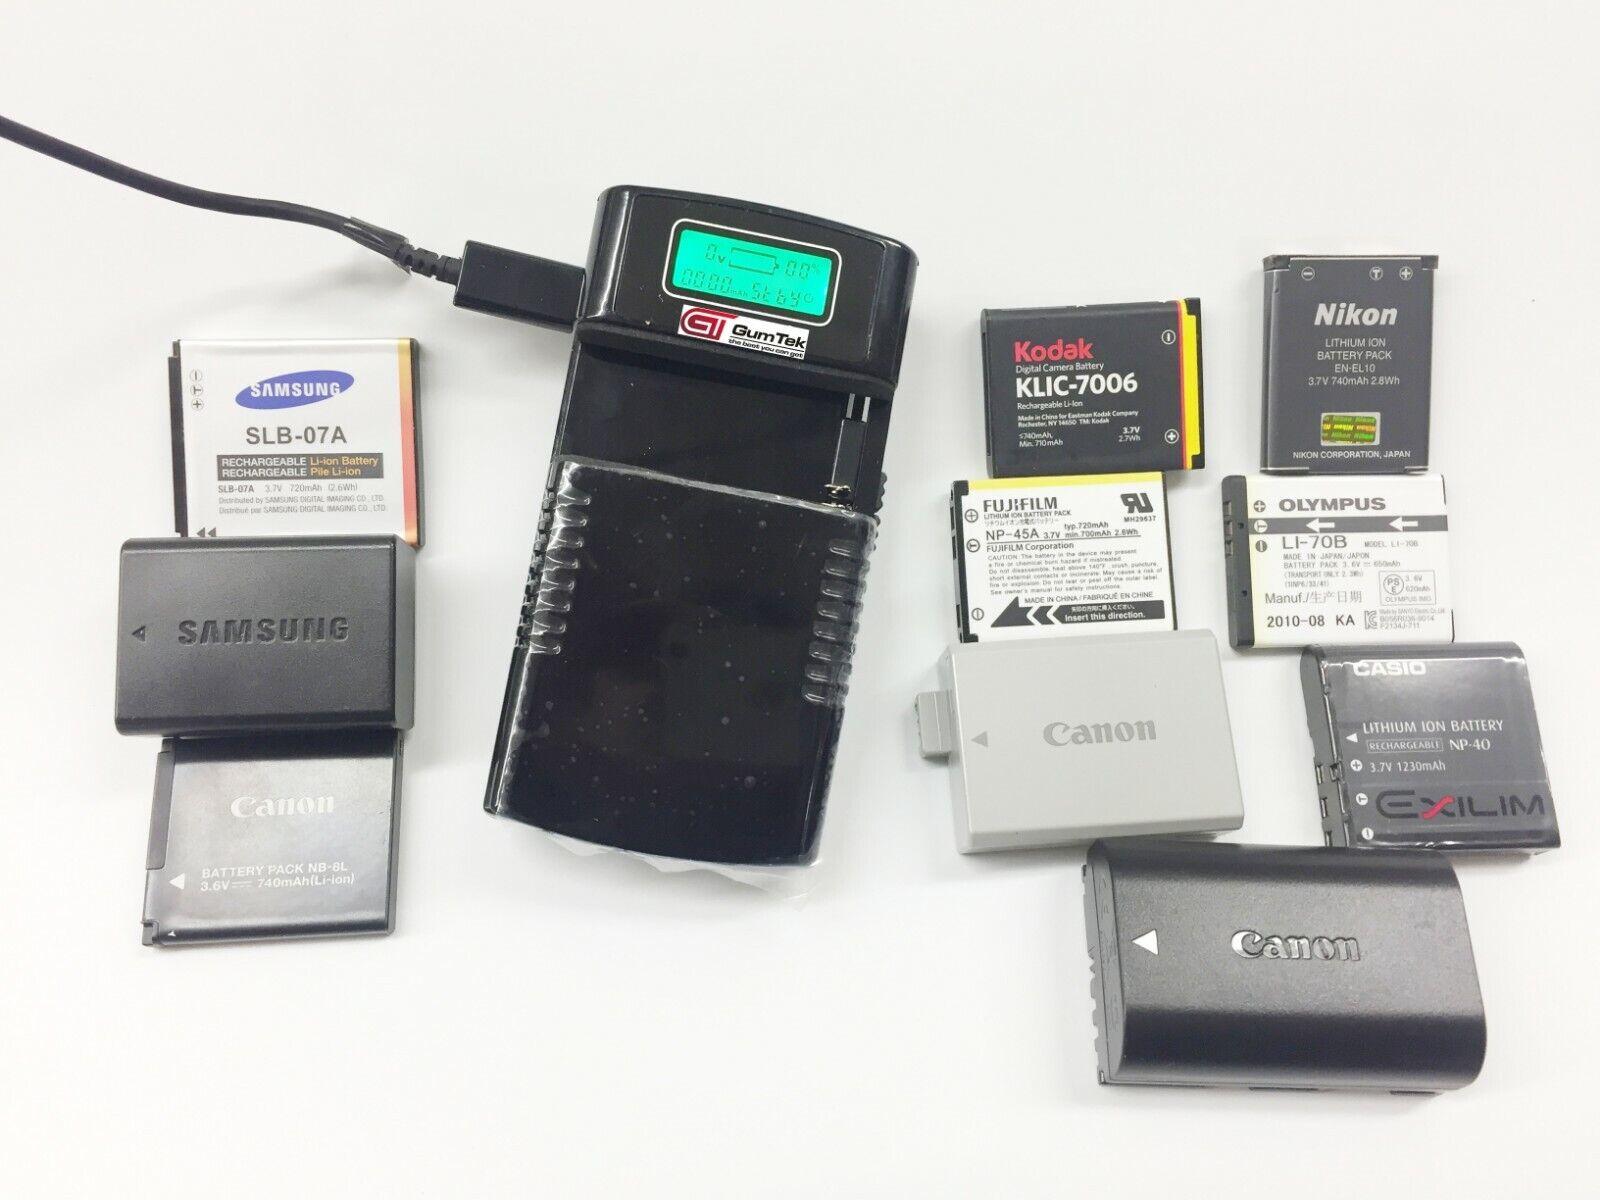 Universal Camera Battery Charger for Canon, Nikon,Sony,Samsung, Fujifilm,Olympus